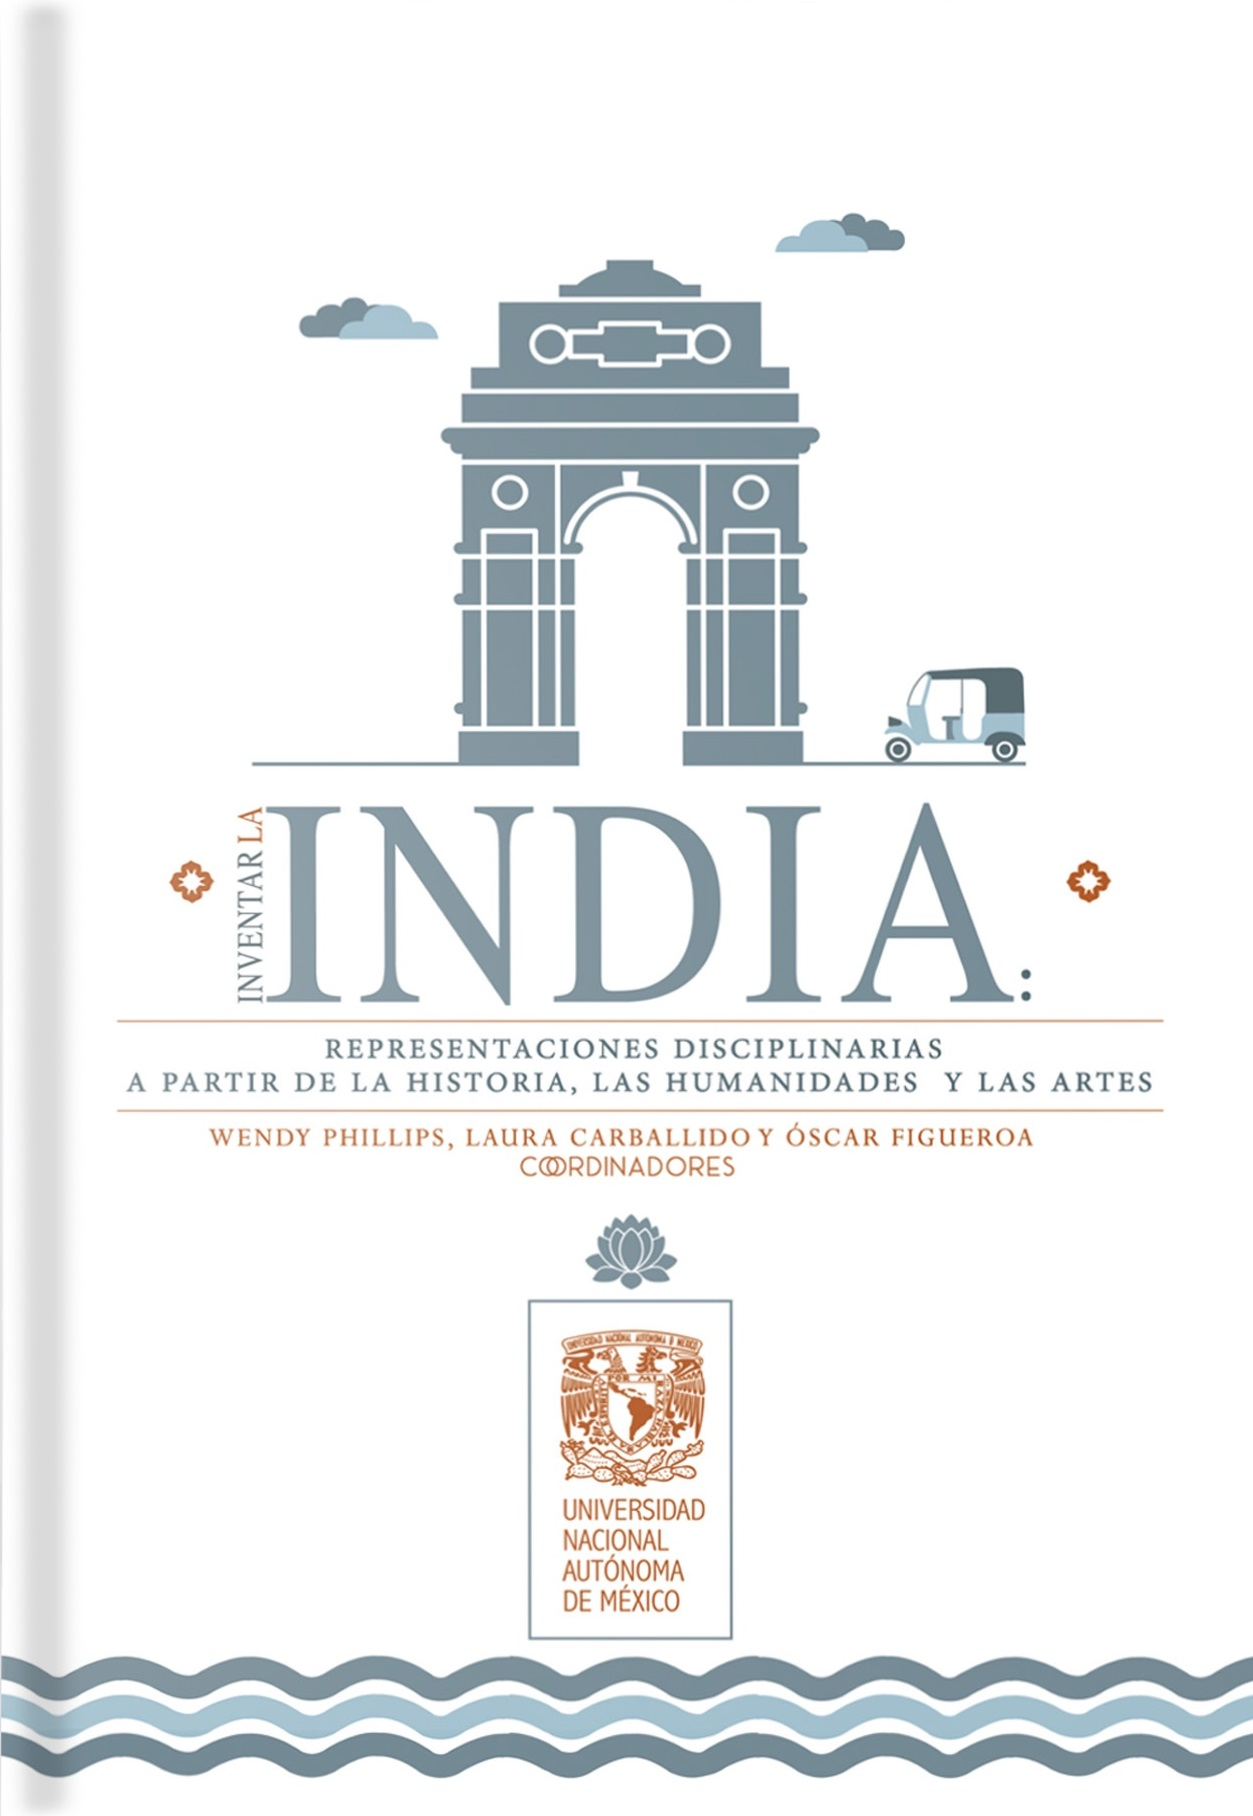 Inventar la India